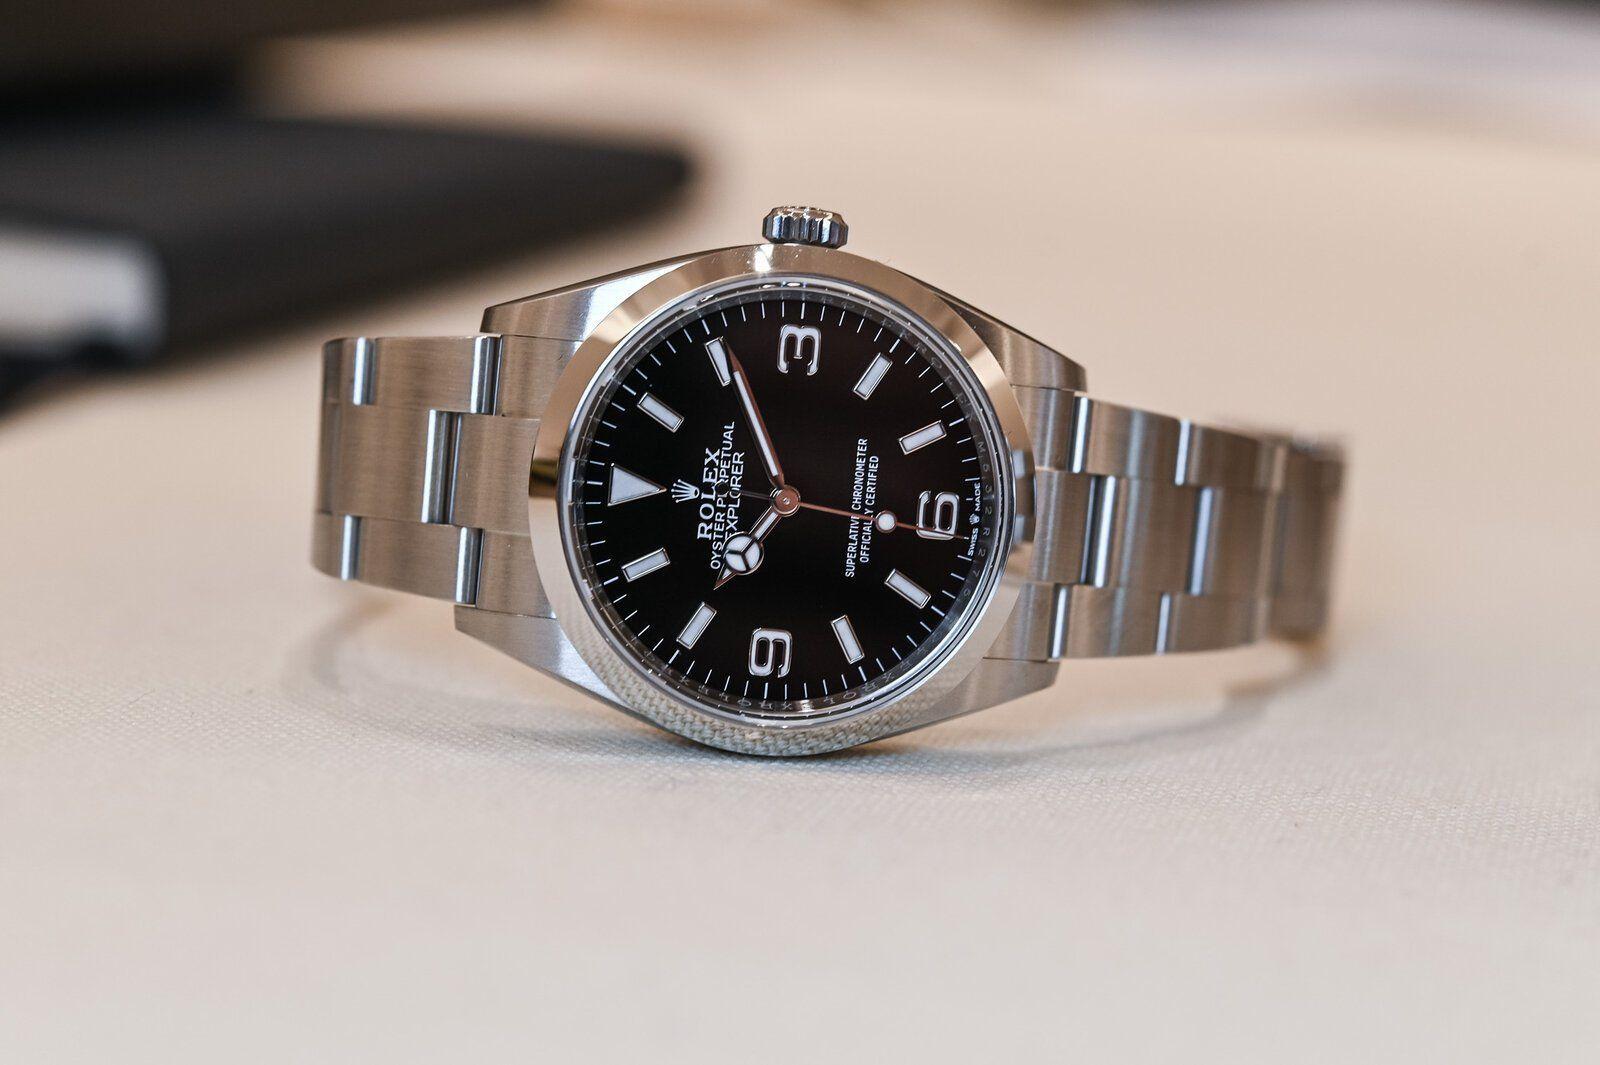 2021-Rolex-Explorer-1-36mm-124270-124273-hands-on-3.jpg